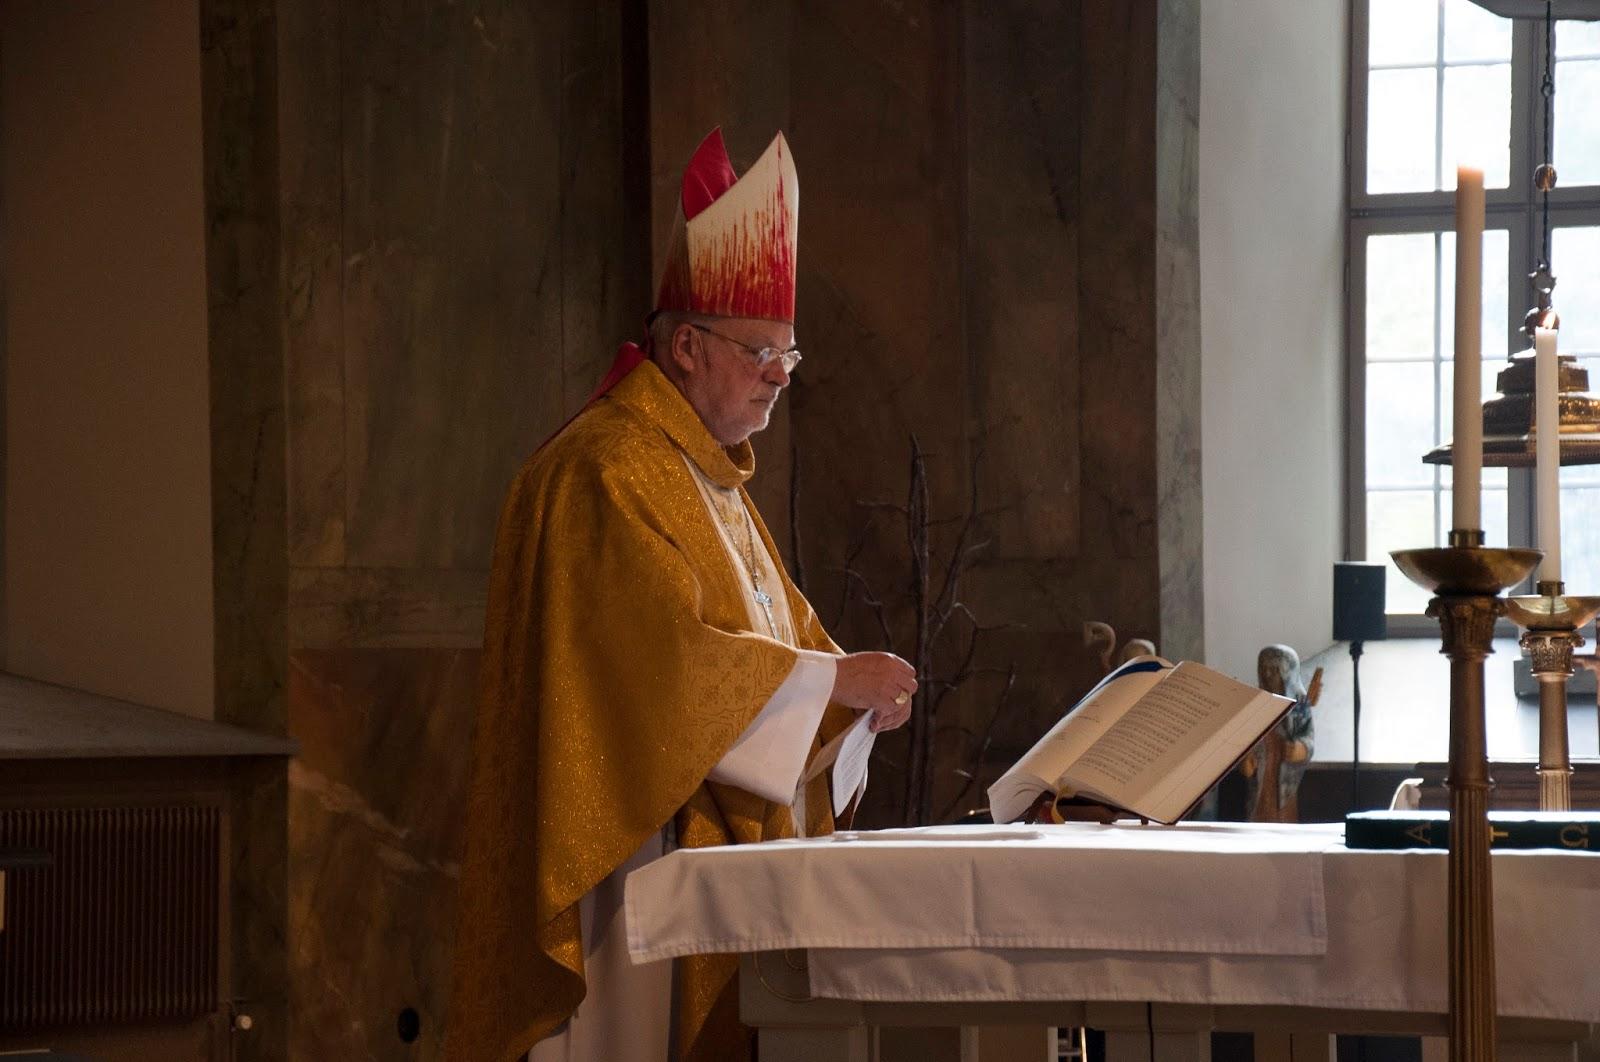 Katolska kyrkans katekes homosexualitet